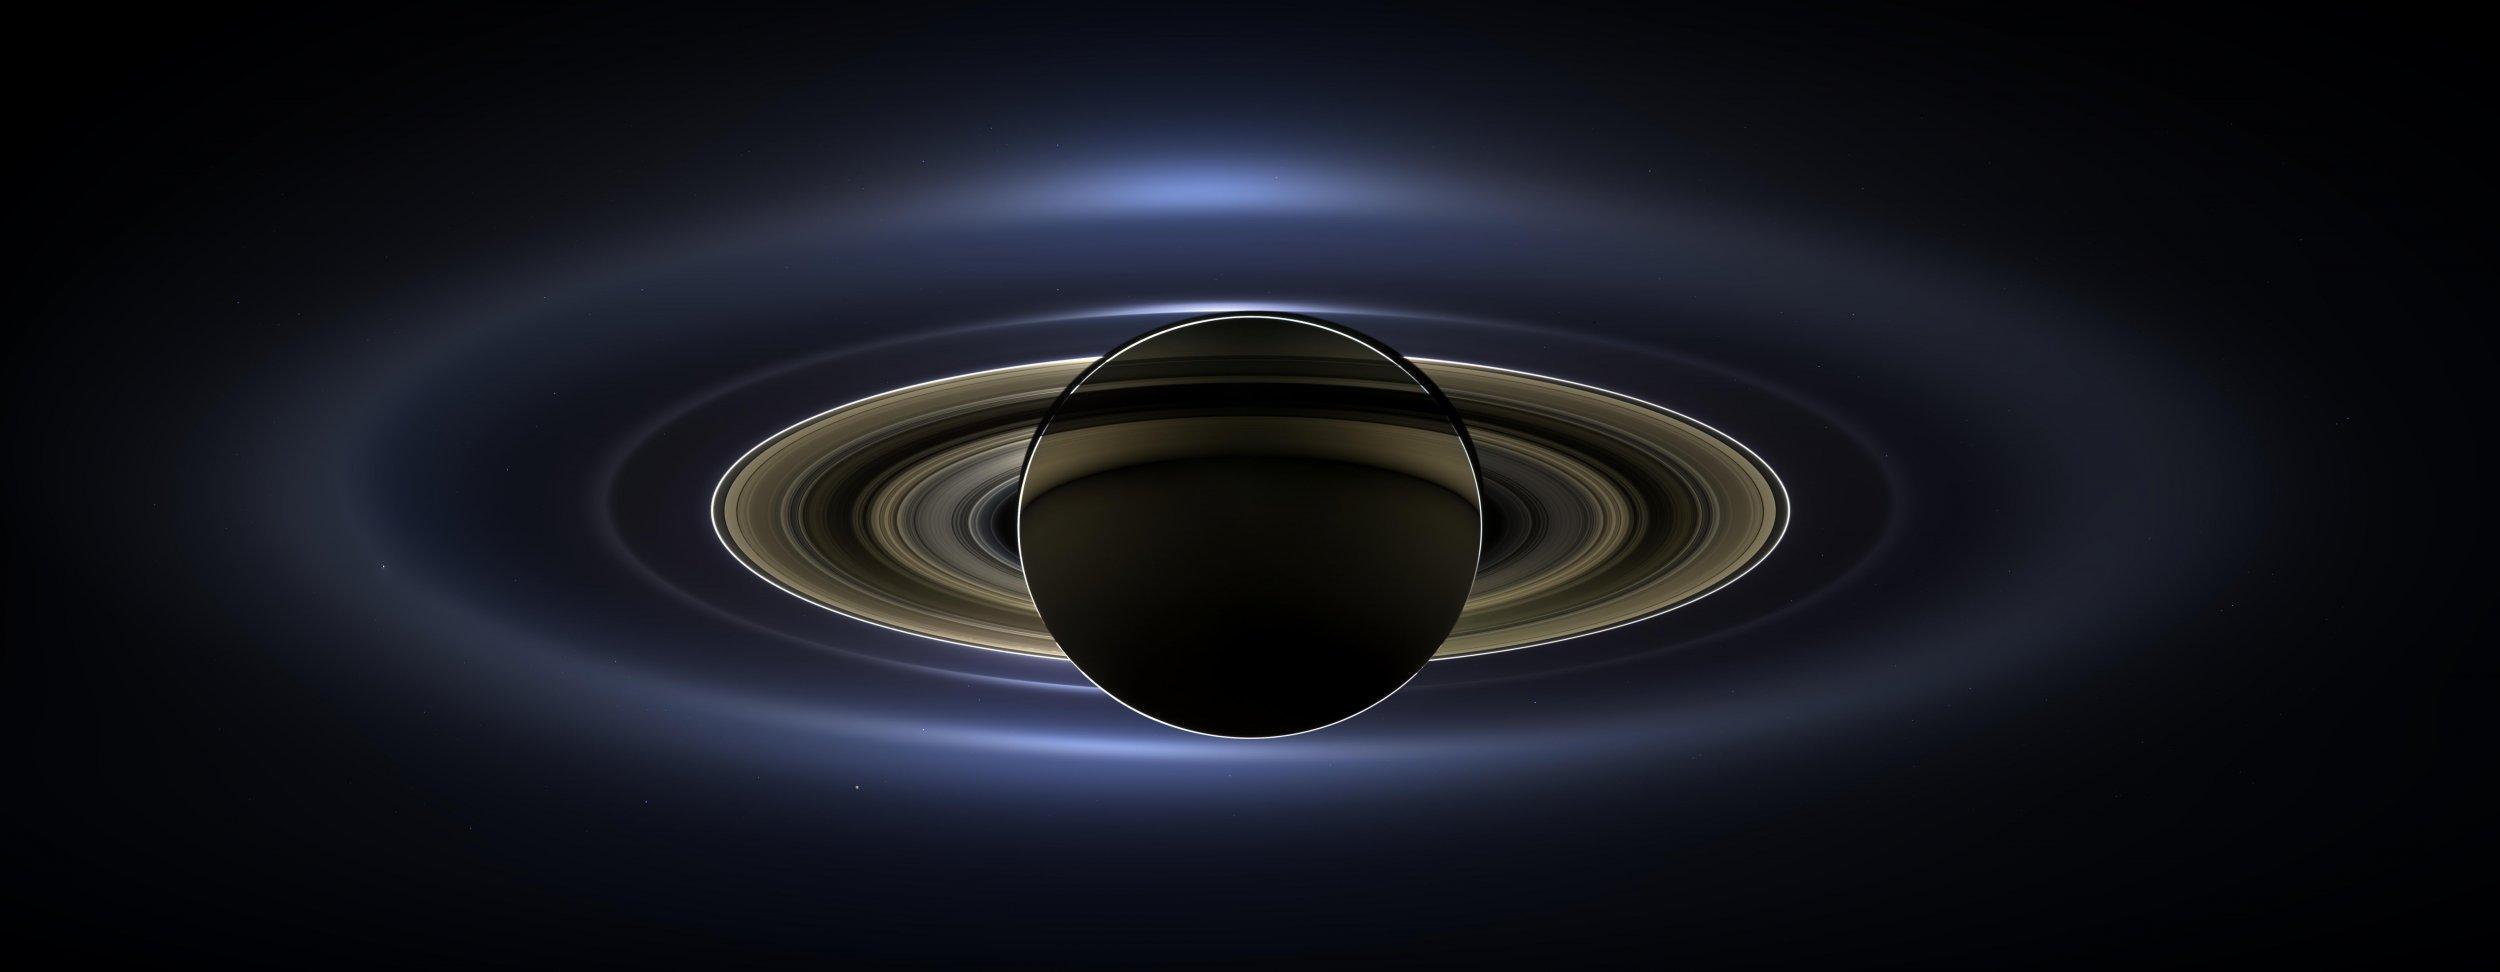 12_21_saturn_ring_moon